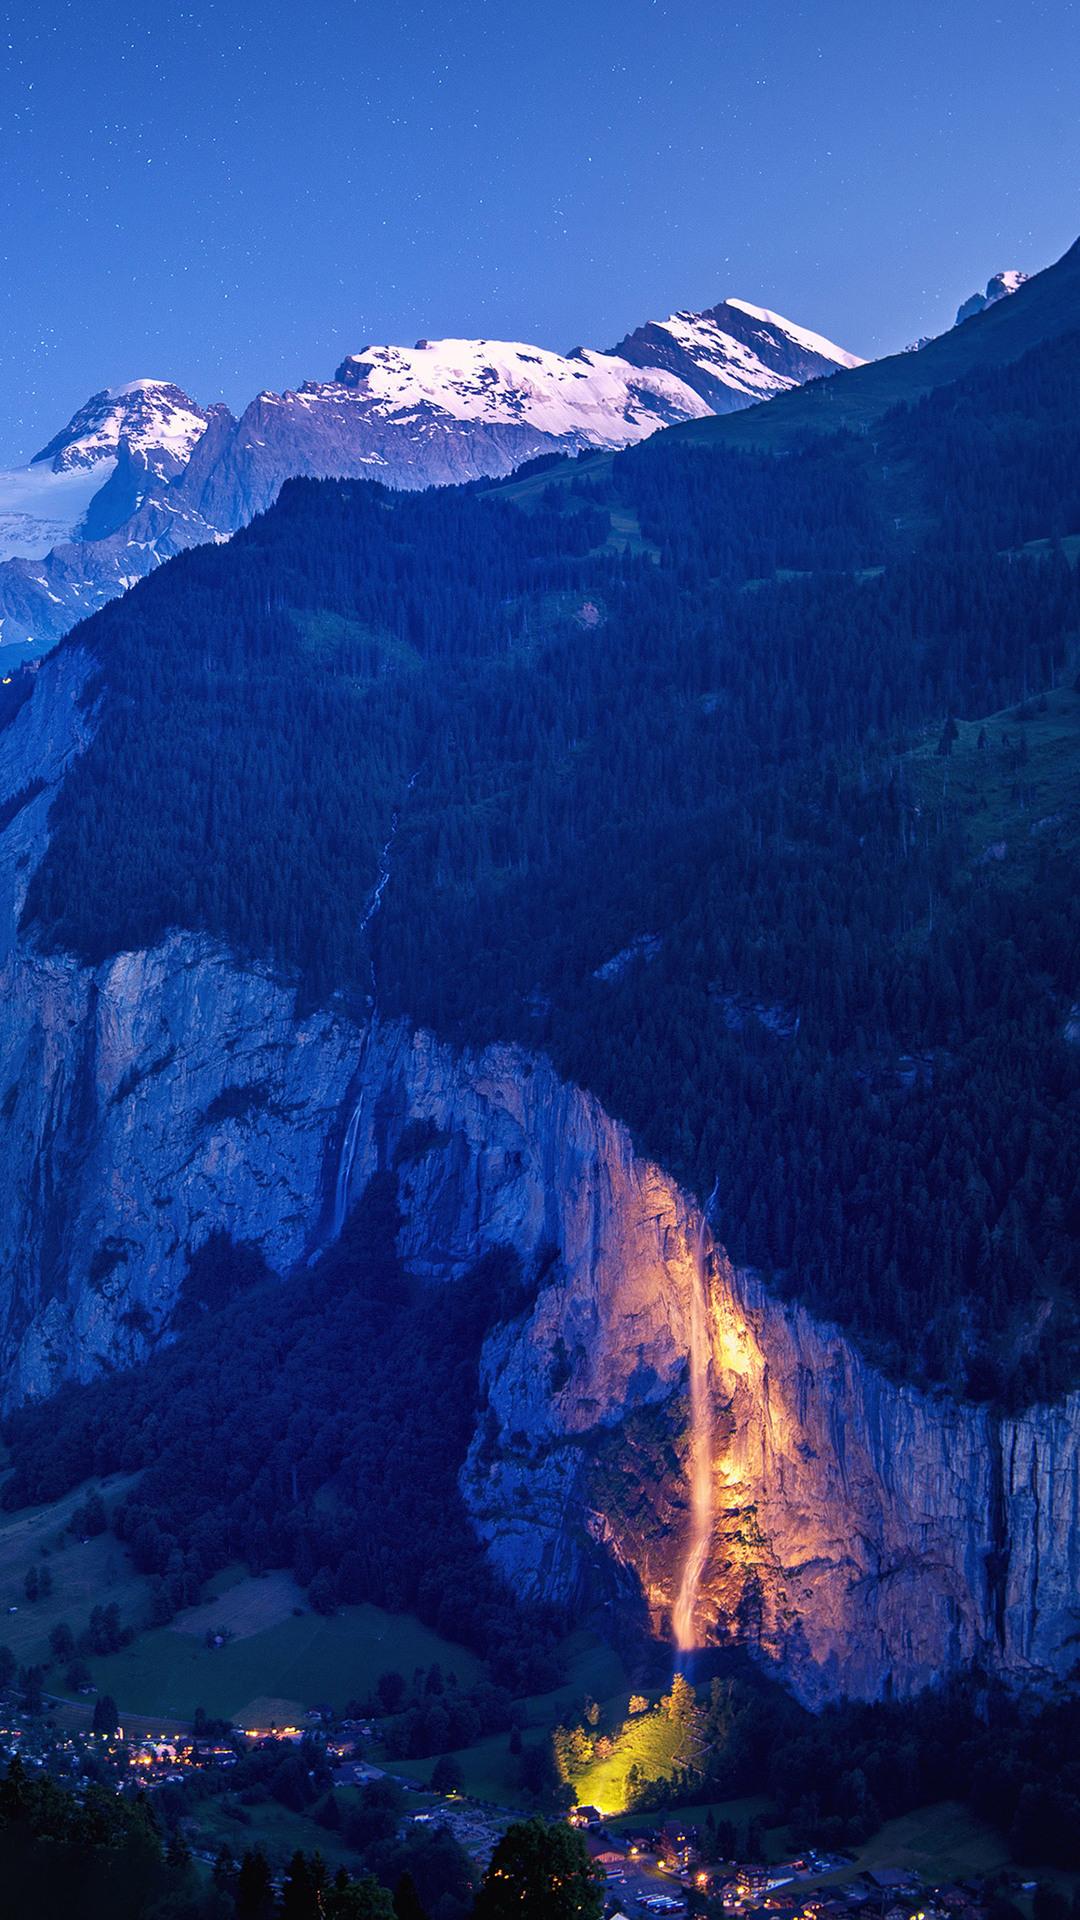 1080x1920 Switzerland Landscape 4k Iphone 7,6s,6 Plus ...